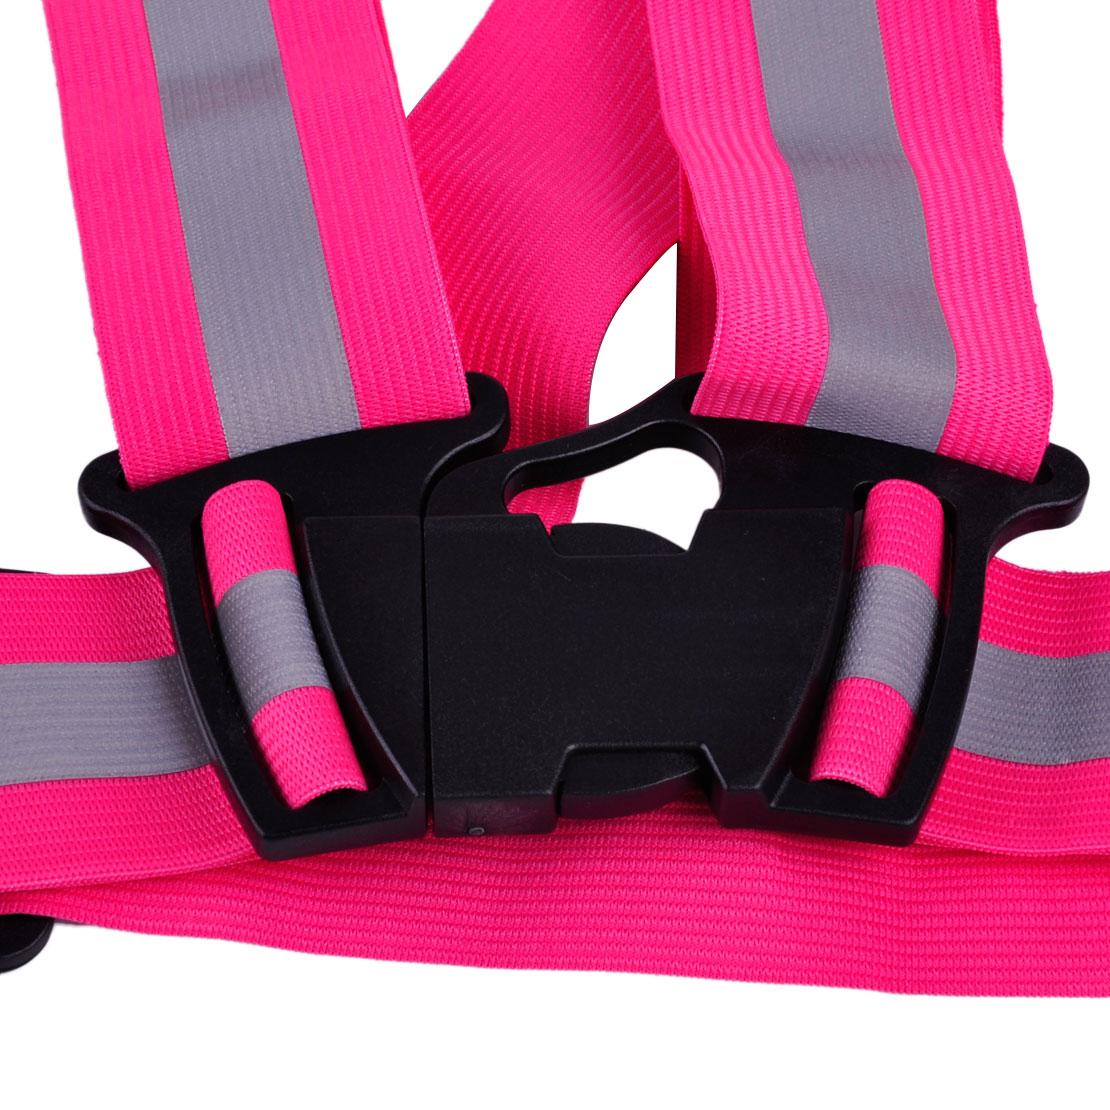 CITALL Adjustable Security Vest Safety Warning Reflective Gear Stripe Safe Belt Outdoor Night Working For Ford Mercedes Audi VW